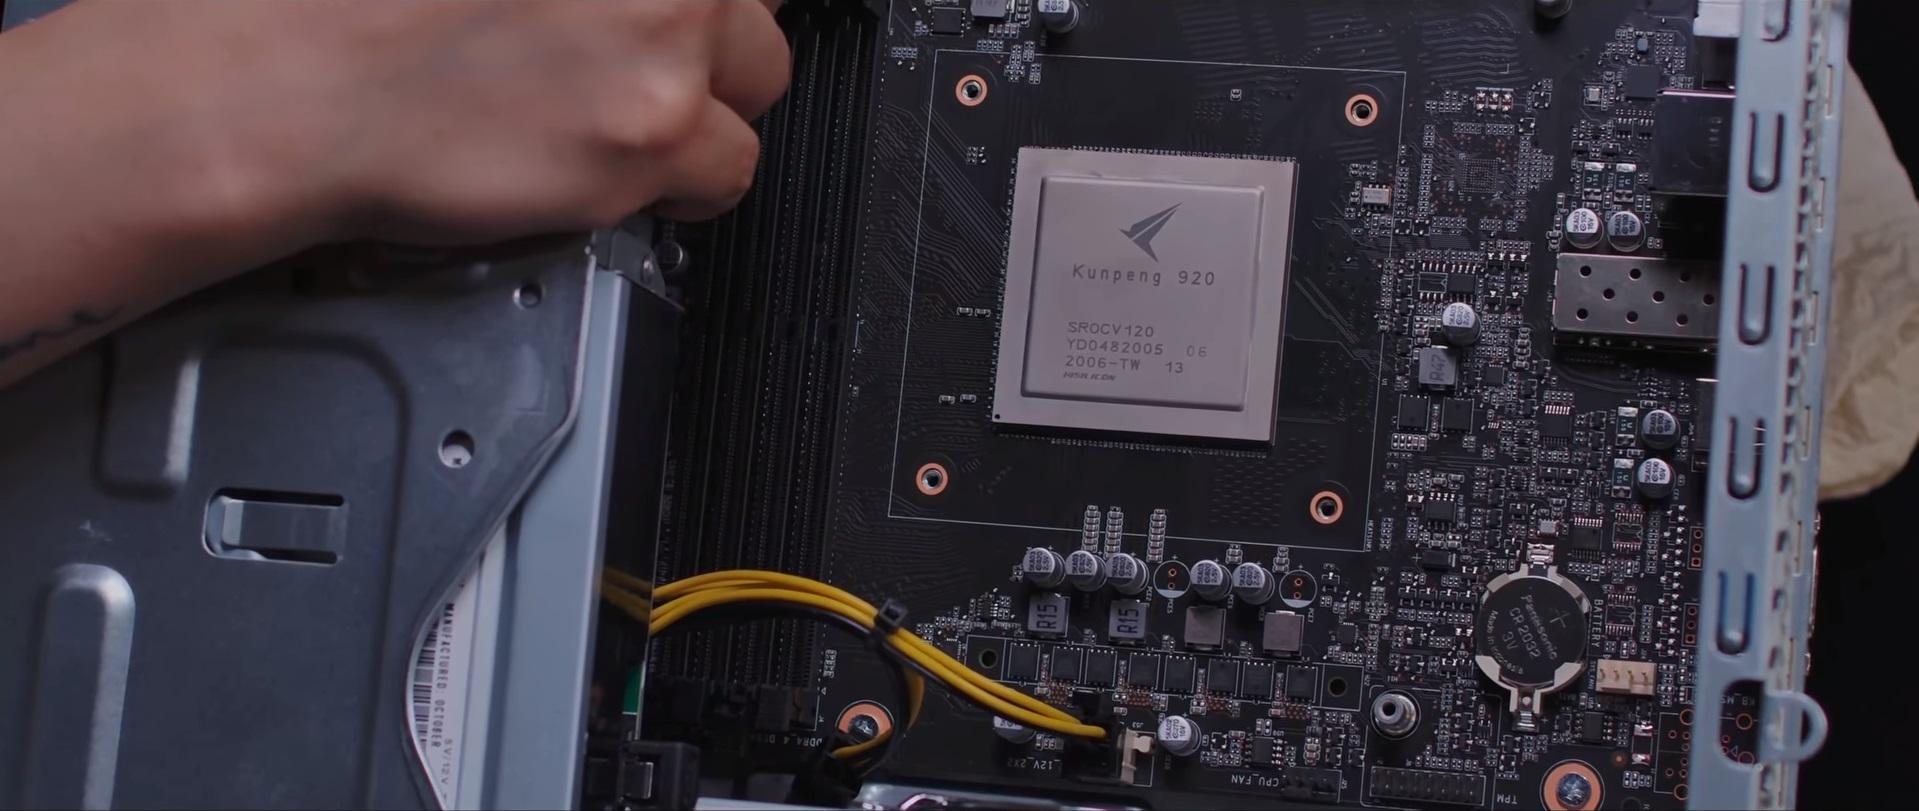 komputer Huawei z procesorem Kunpeng 920